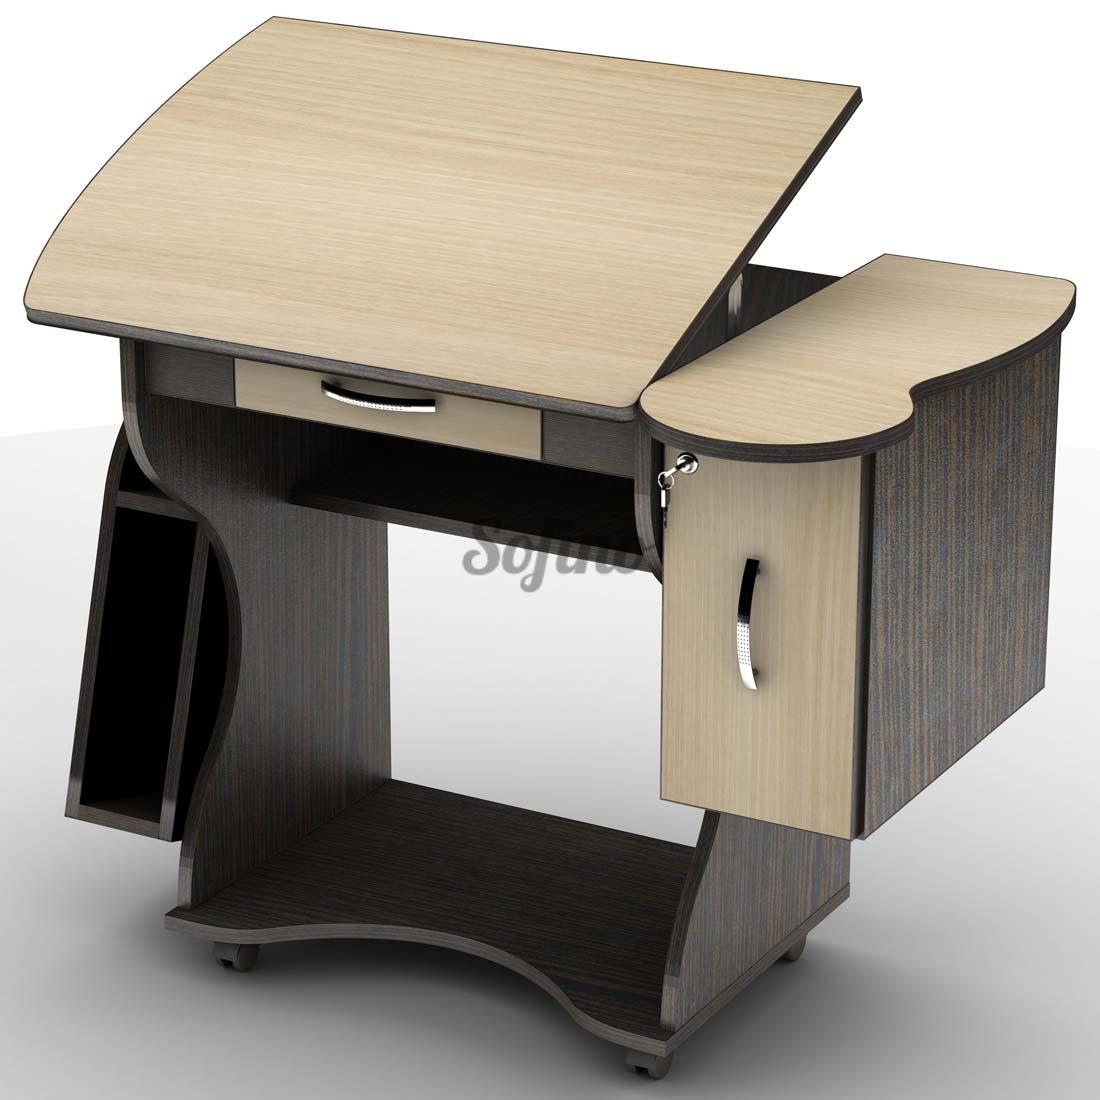 Фото Письменный стол СУ-2 К «Универсал» меламин Тіса Меблі - sofino.ua